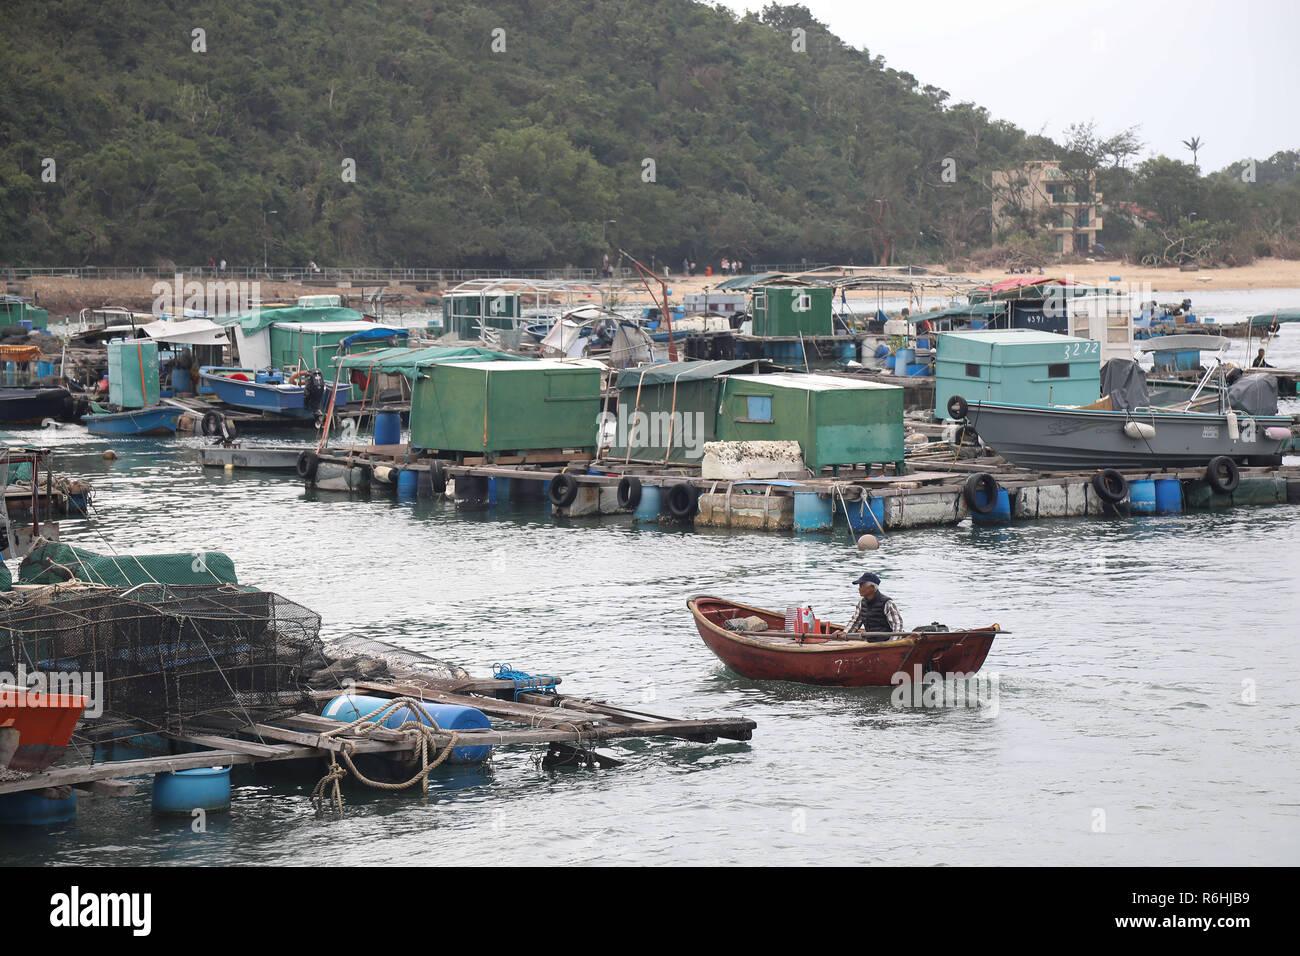 Sok Kwu Wan Fishing Village on Lamma Island - Stock Image